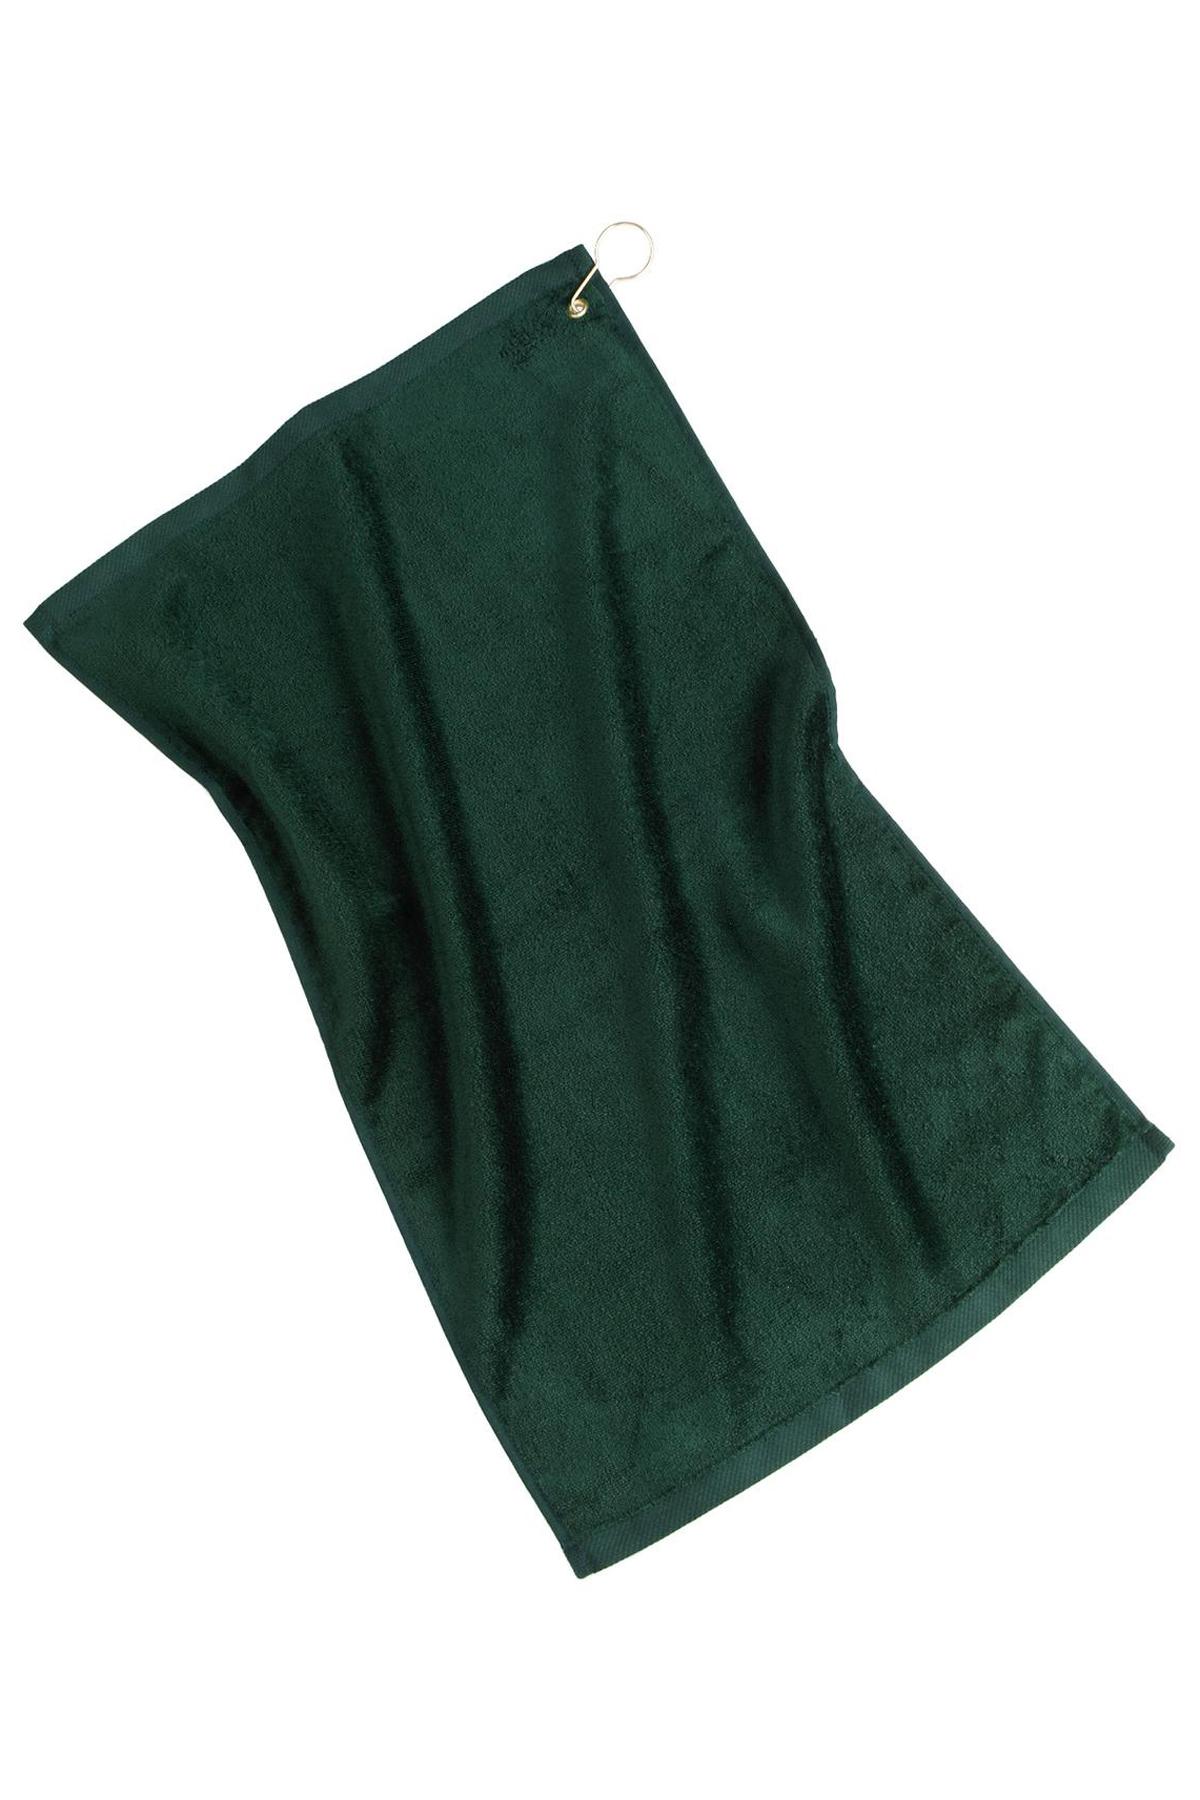 Accessories-Golf-Towels-5